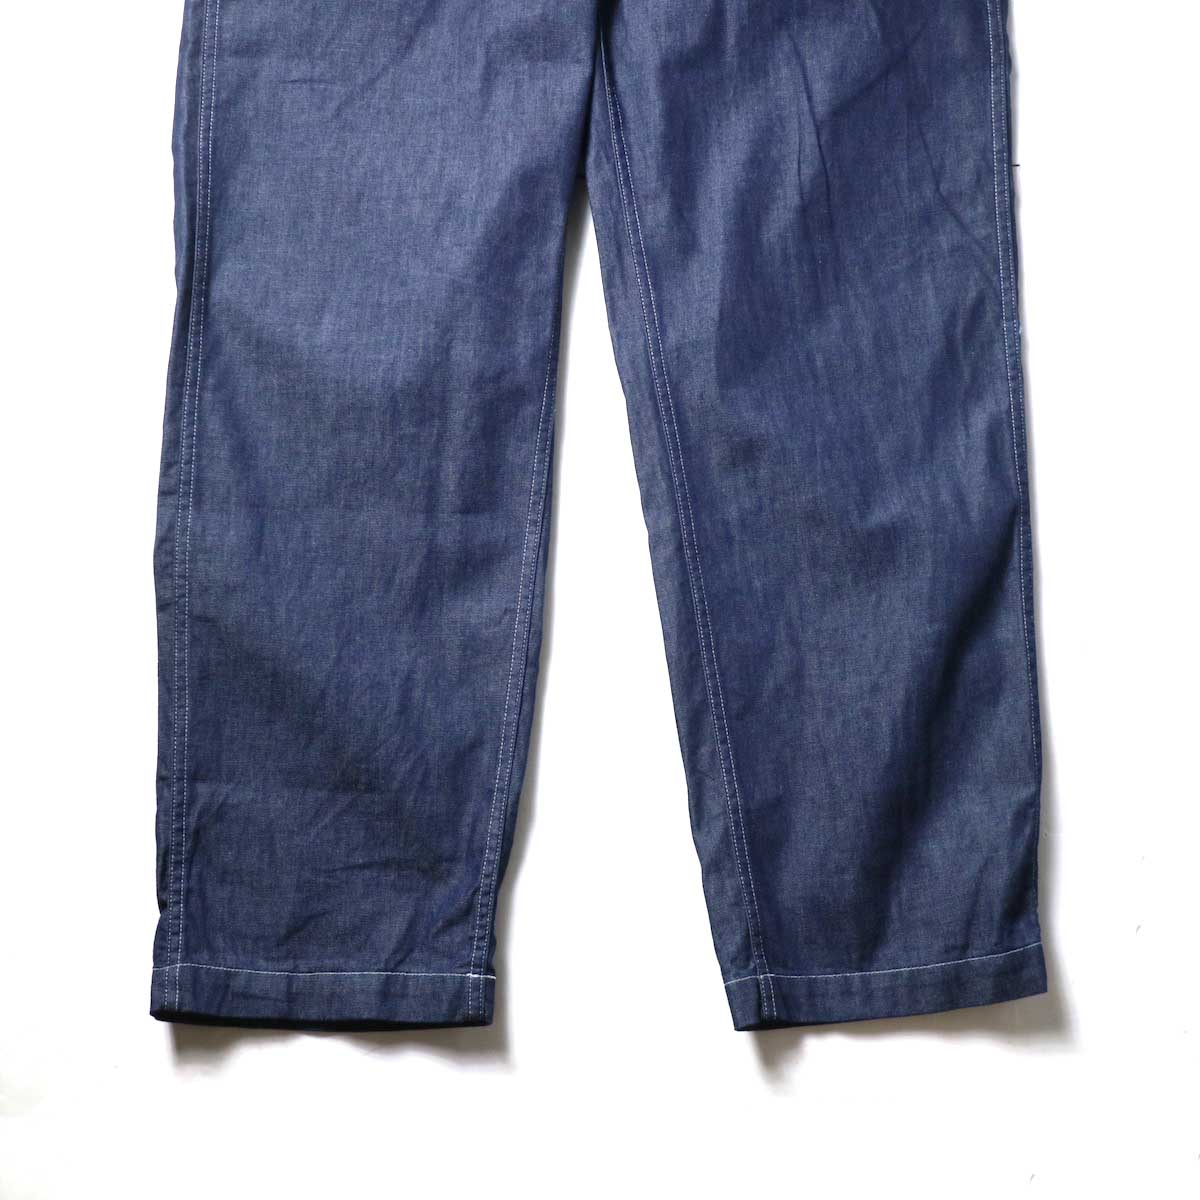 Engineered Garments / Fatigue Pant - 8oz Cone Denim (Indigo)裾